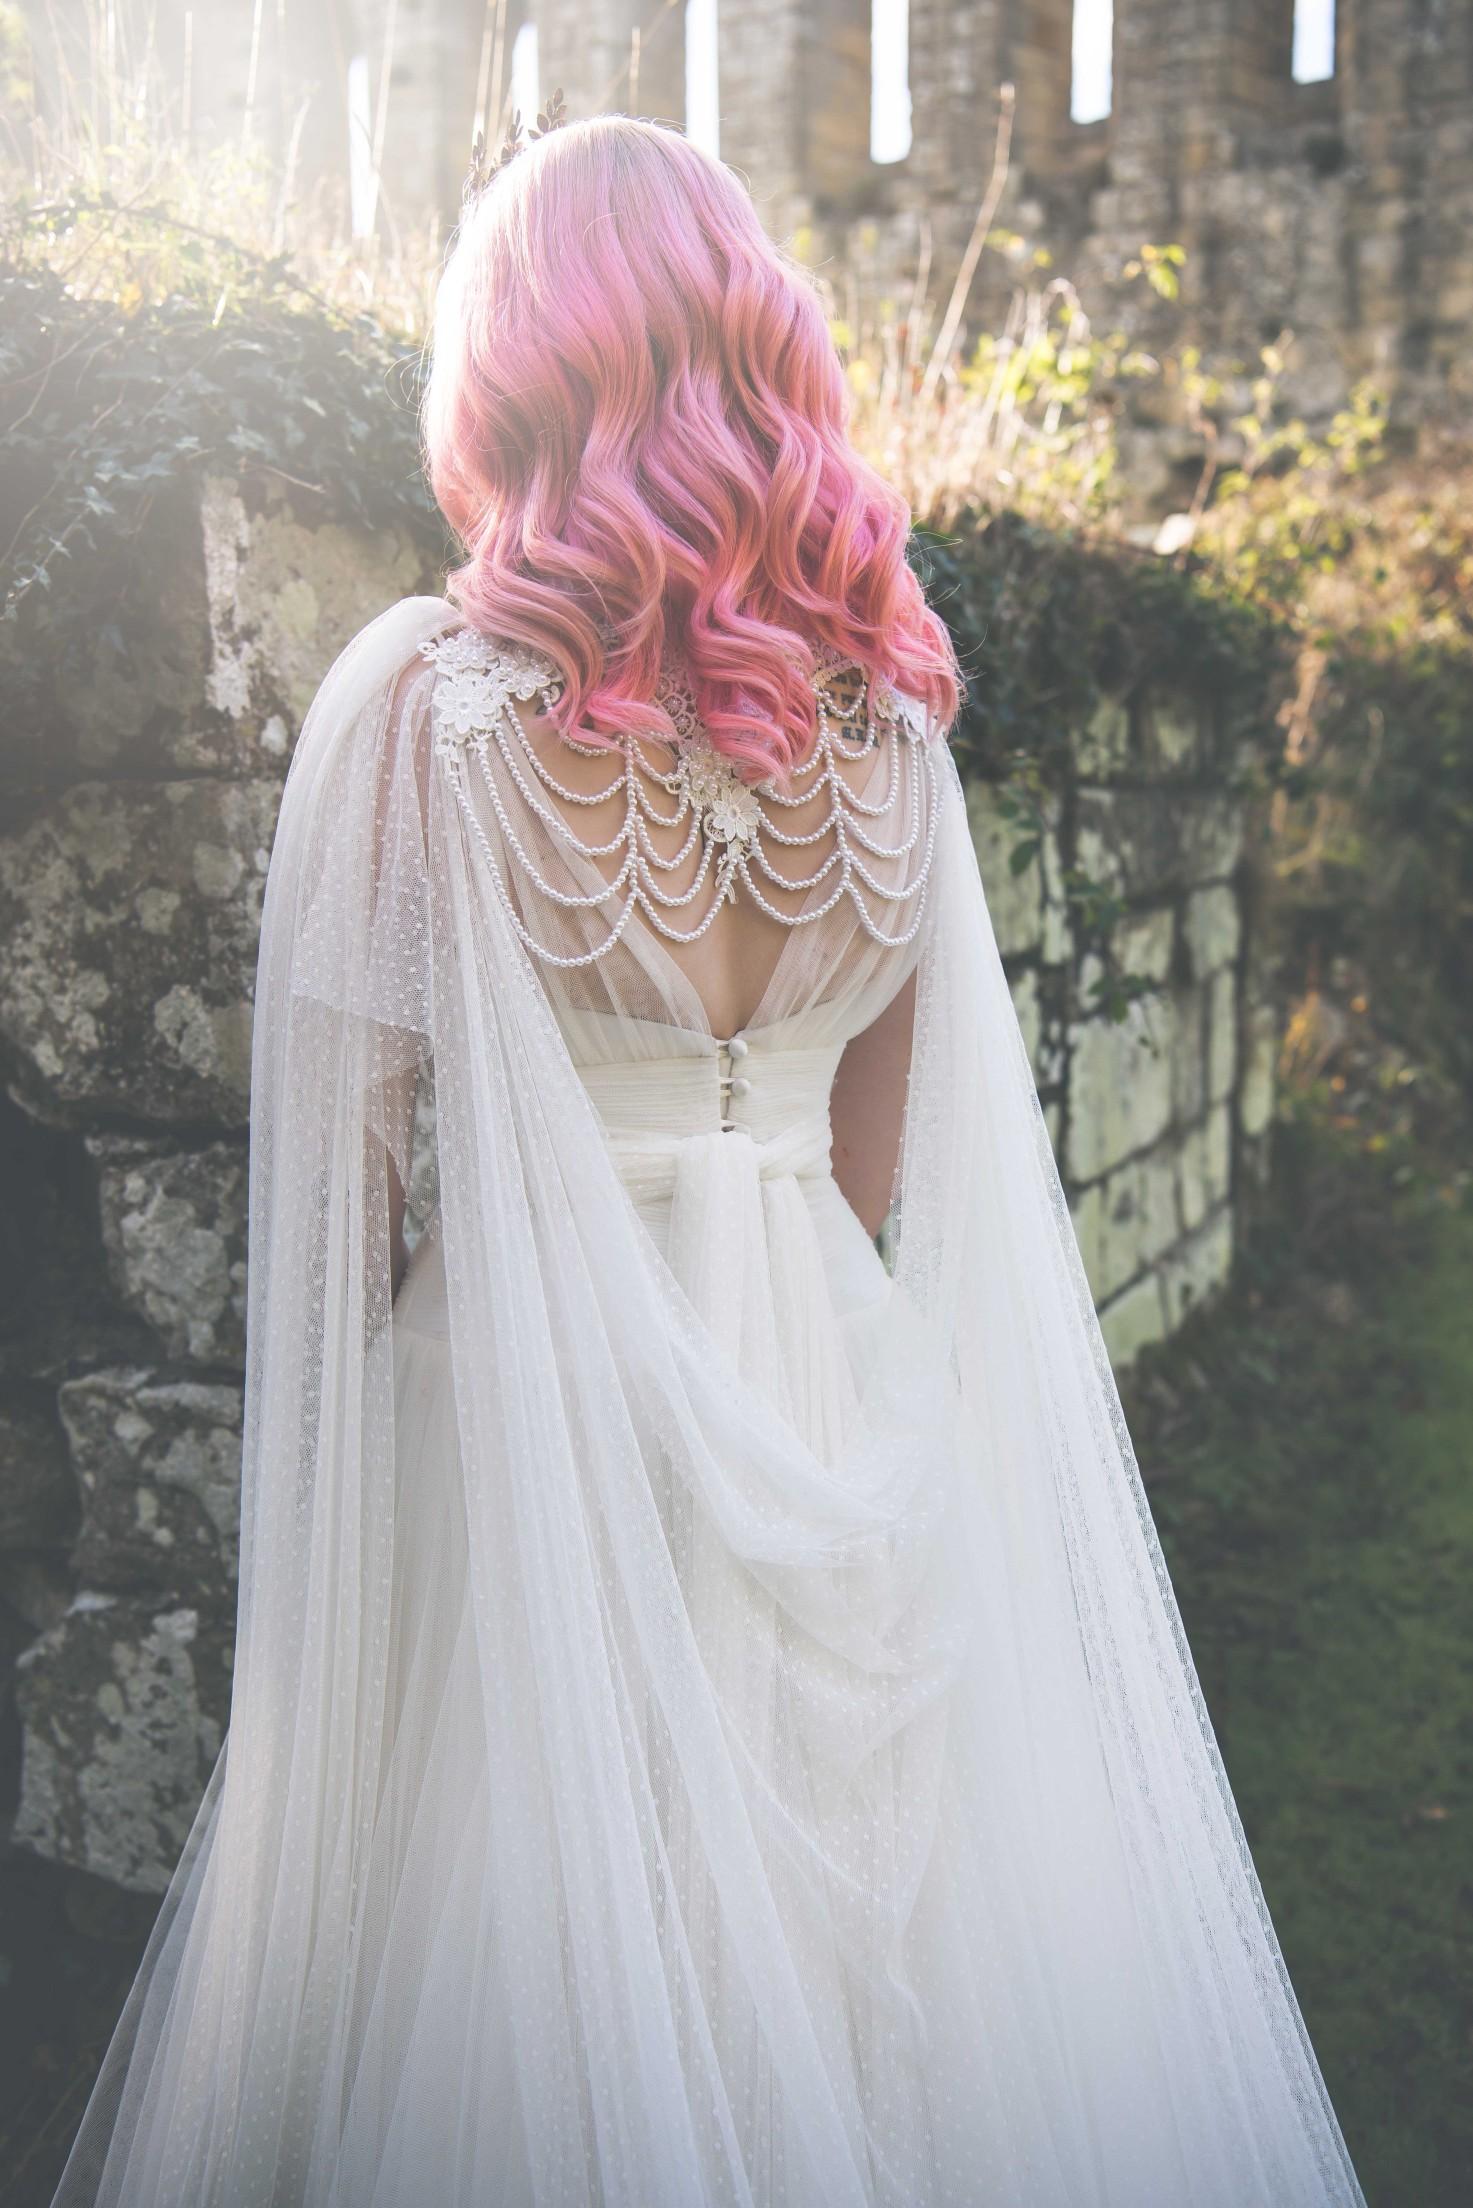 Live your own fairytale wedding - BexBrides -Jervaulx-0005 [2-6] (2)